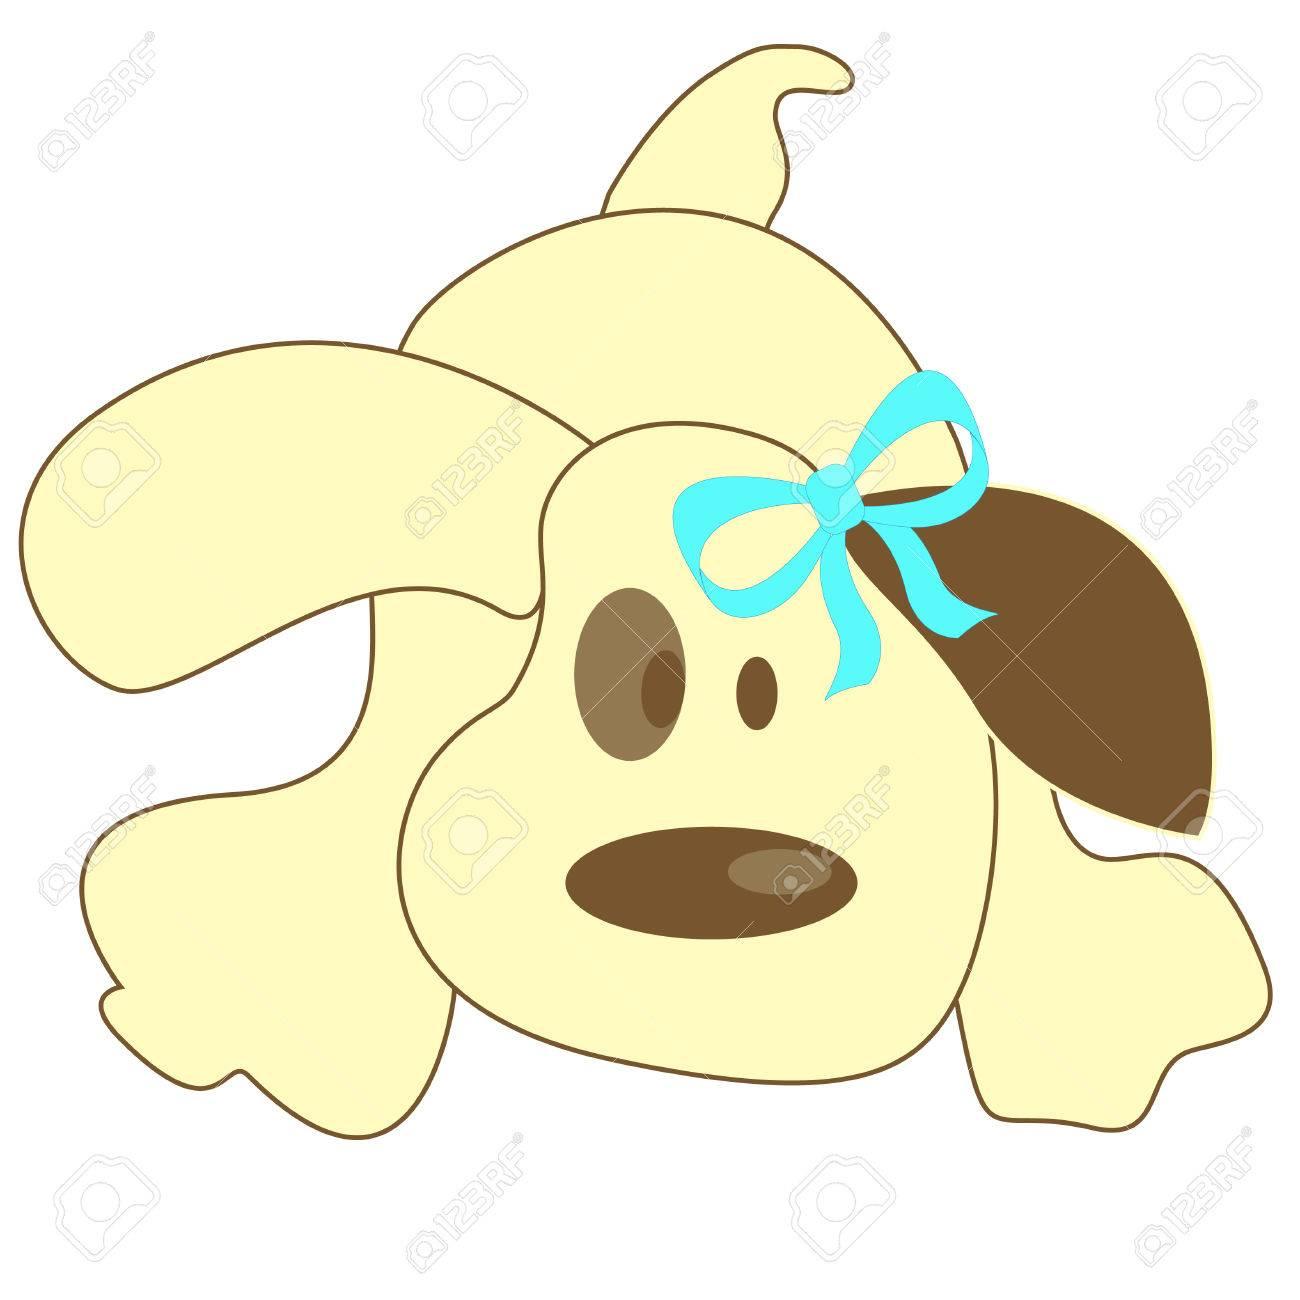 Light cartoon dog Stock Vector - 8142650